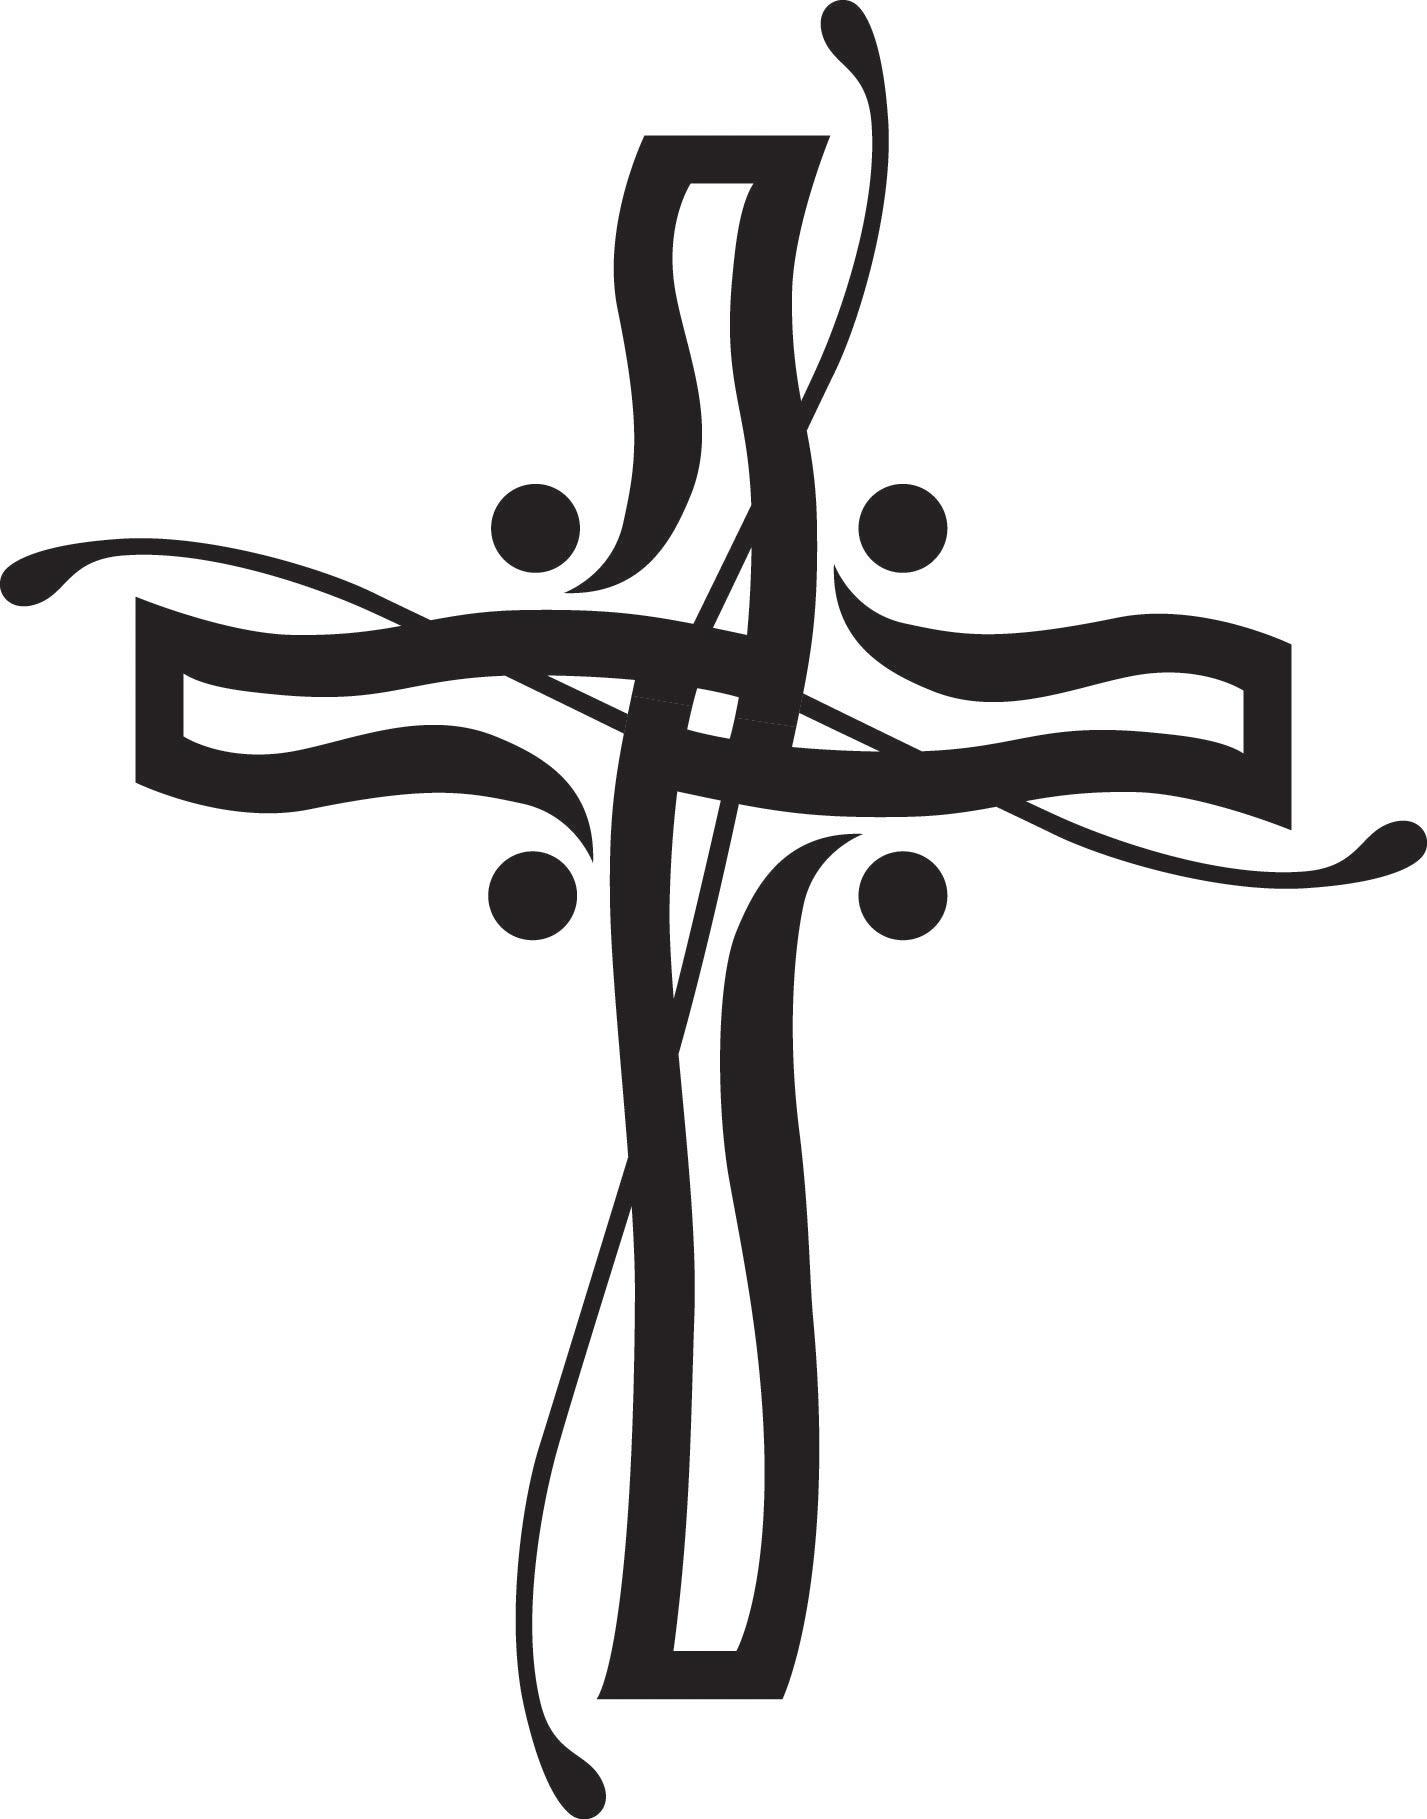 Black Clipart Christian - ClipArt Best